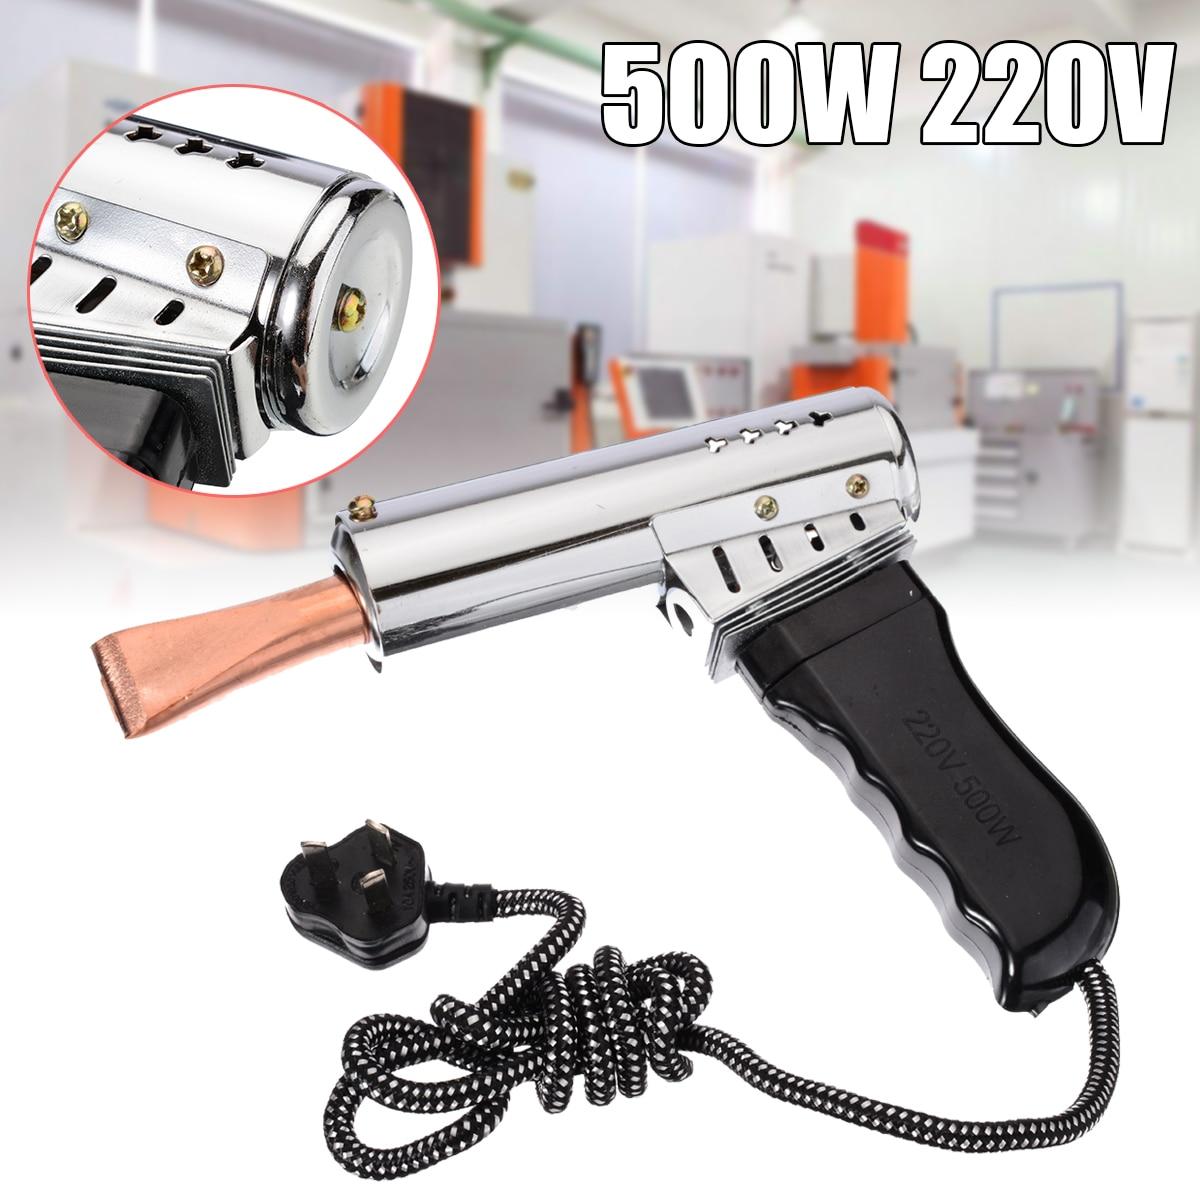 1pc 220V High Power Chisel Tip Soldering Iron Chisel Tip 500W Electric Soldering Iron Manufacturing Power Tool